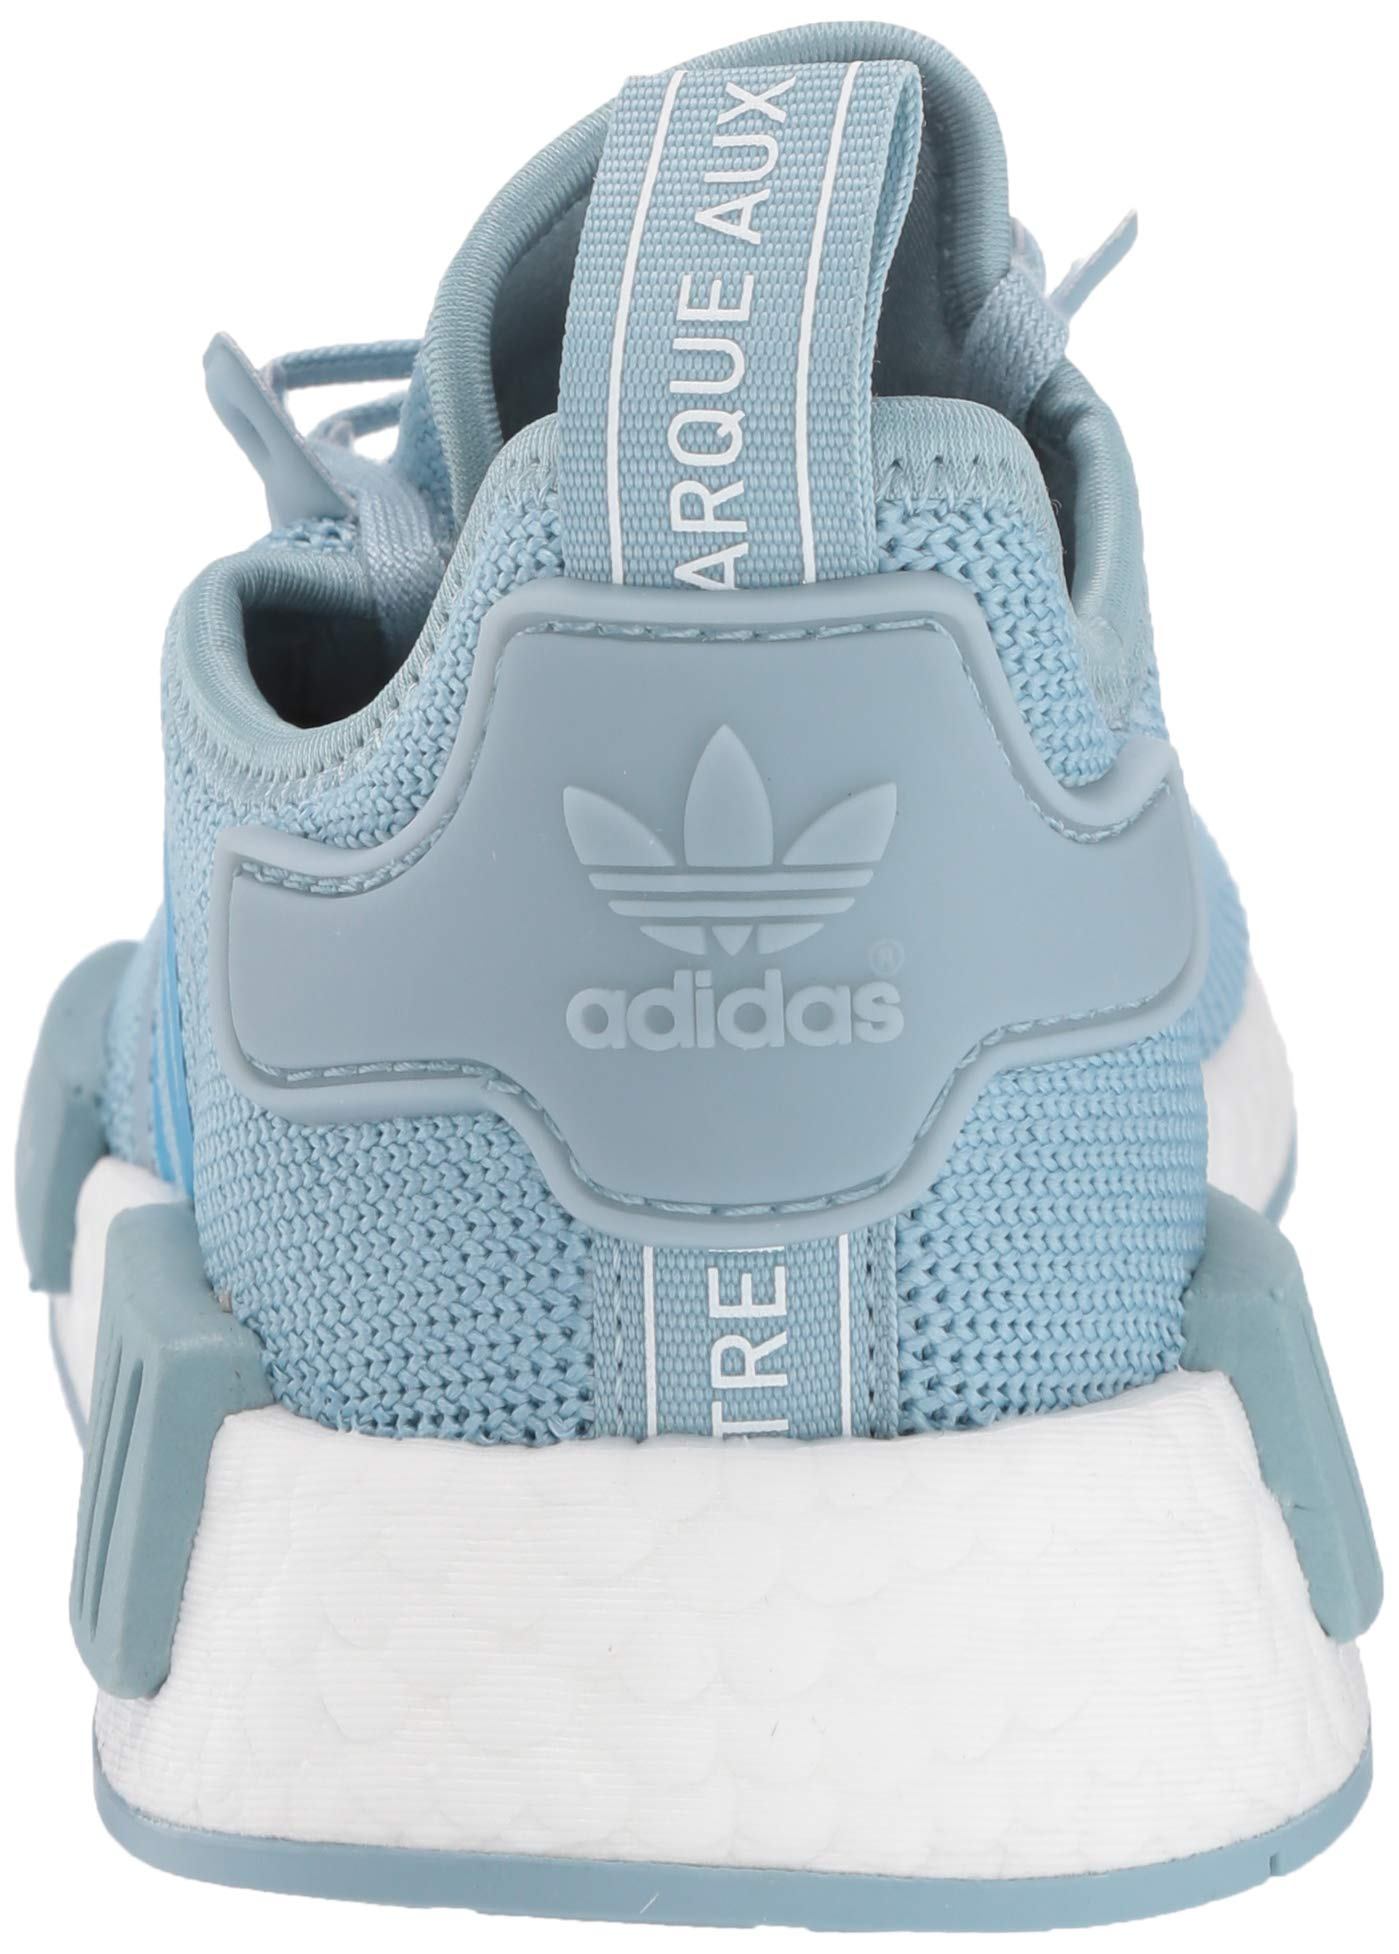 adidas Originals Unisex NMD_R1 Running Shoe ash Grey/Shock Cyan/White 4 M US Big Kid by adidas Originals (Image #2)